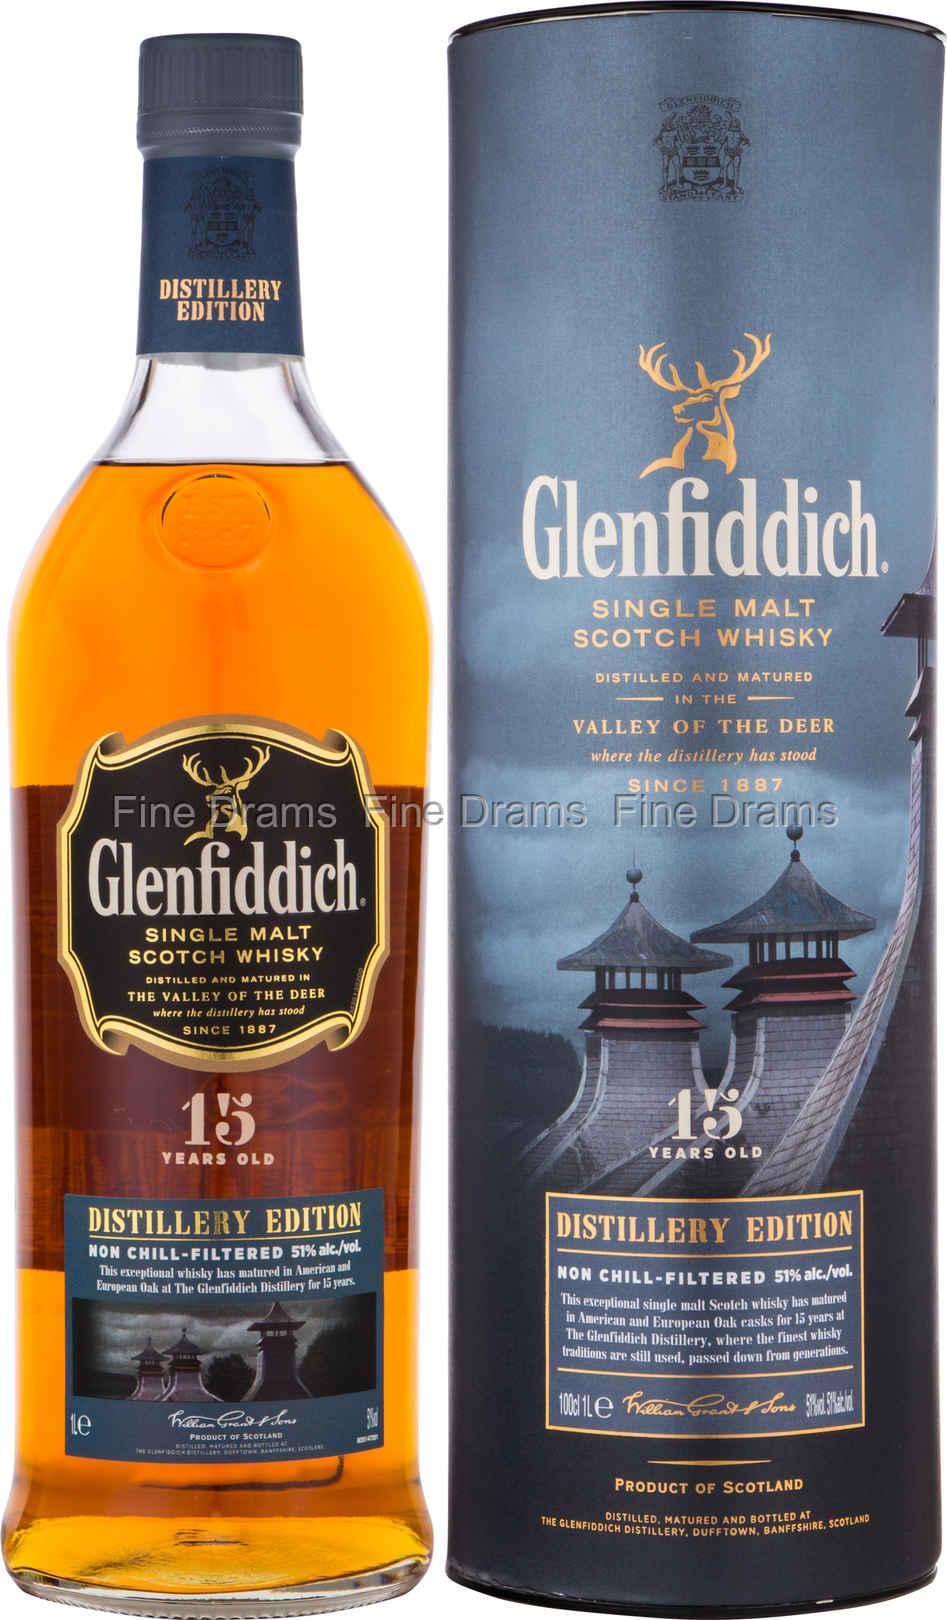 Glenfiddich 15 Year Old Distillery Edition Whisky 1 Liter